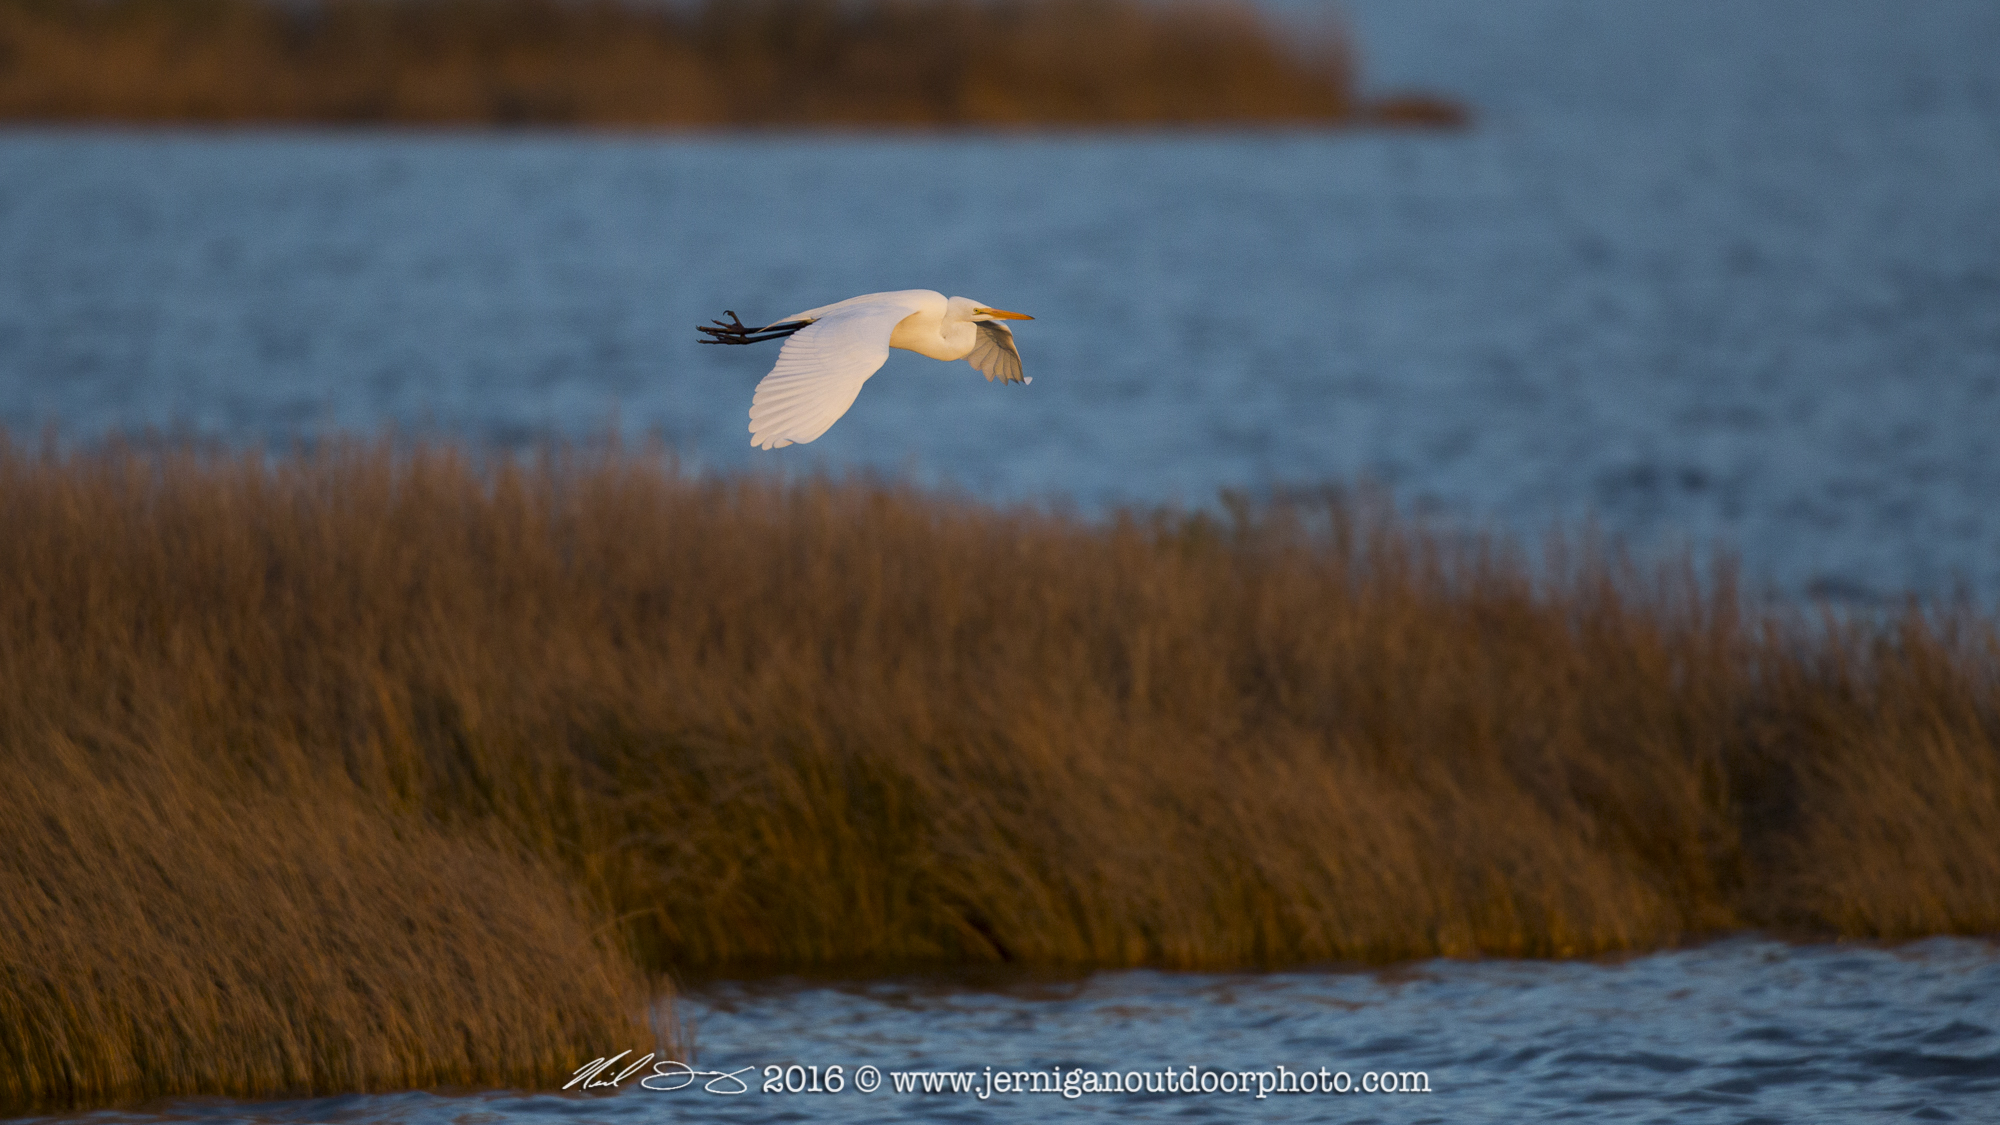 Egret flying in the early morning light